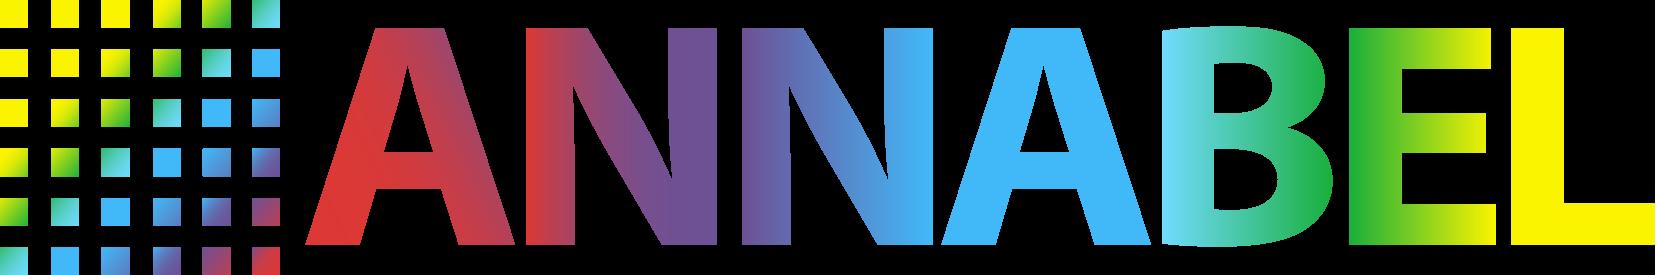 Annabel Logotype